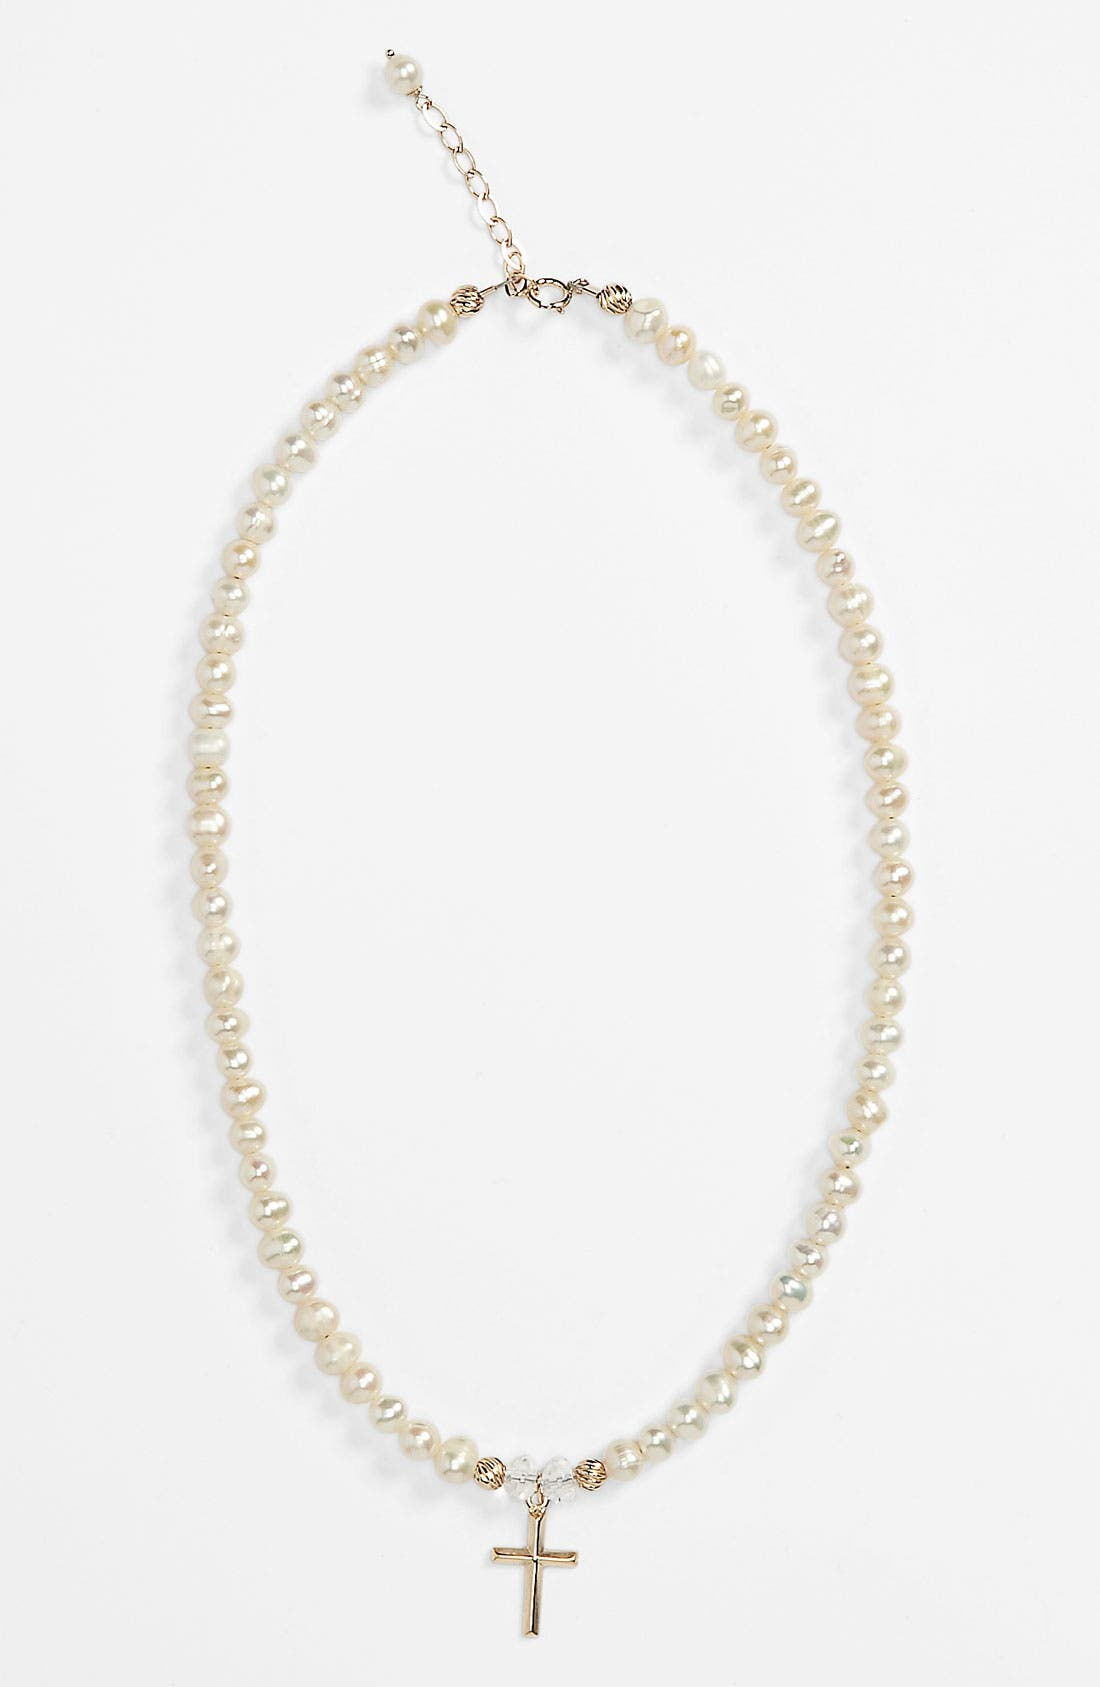 Main Image - Abela Designs Freshwater Pearl Necklace (Girls)